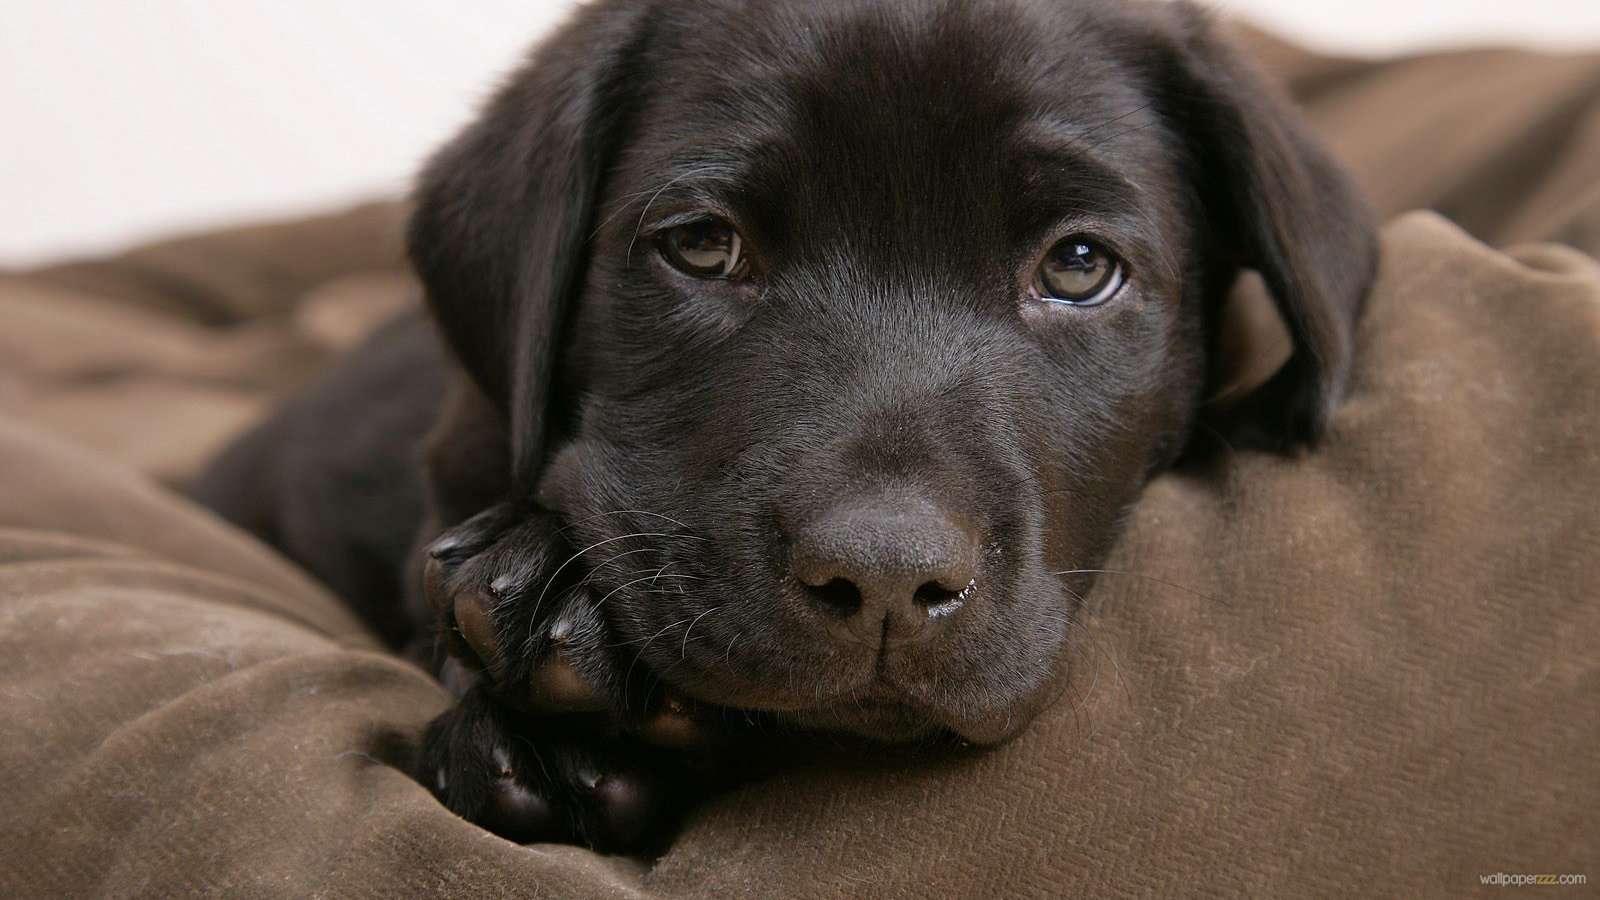 Chocolate Labrador Puppy Widescreen Wallpaper Wallpaper 1600x900